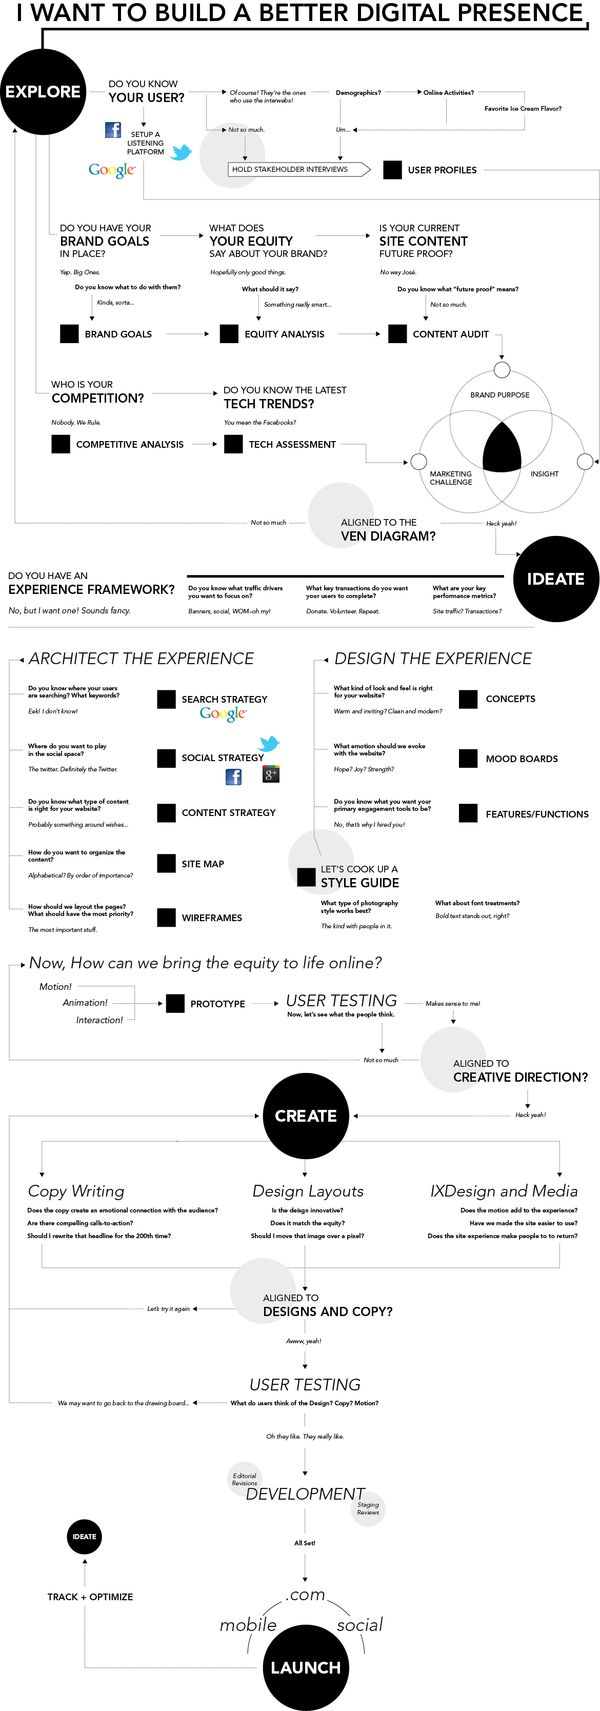 Building a Digital Presence - We don't build websites, we design experiences